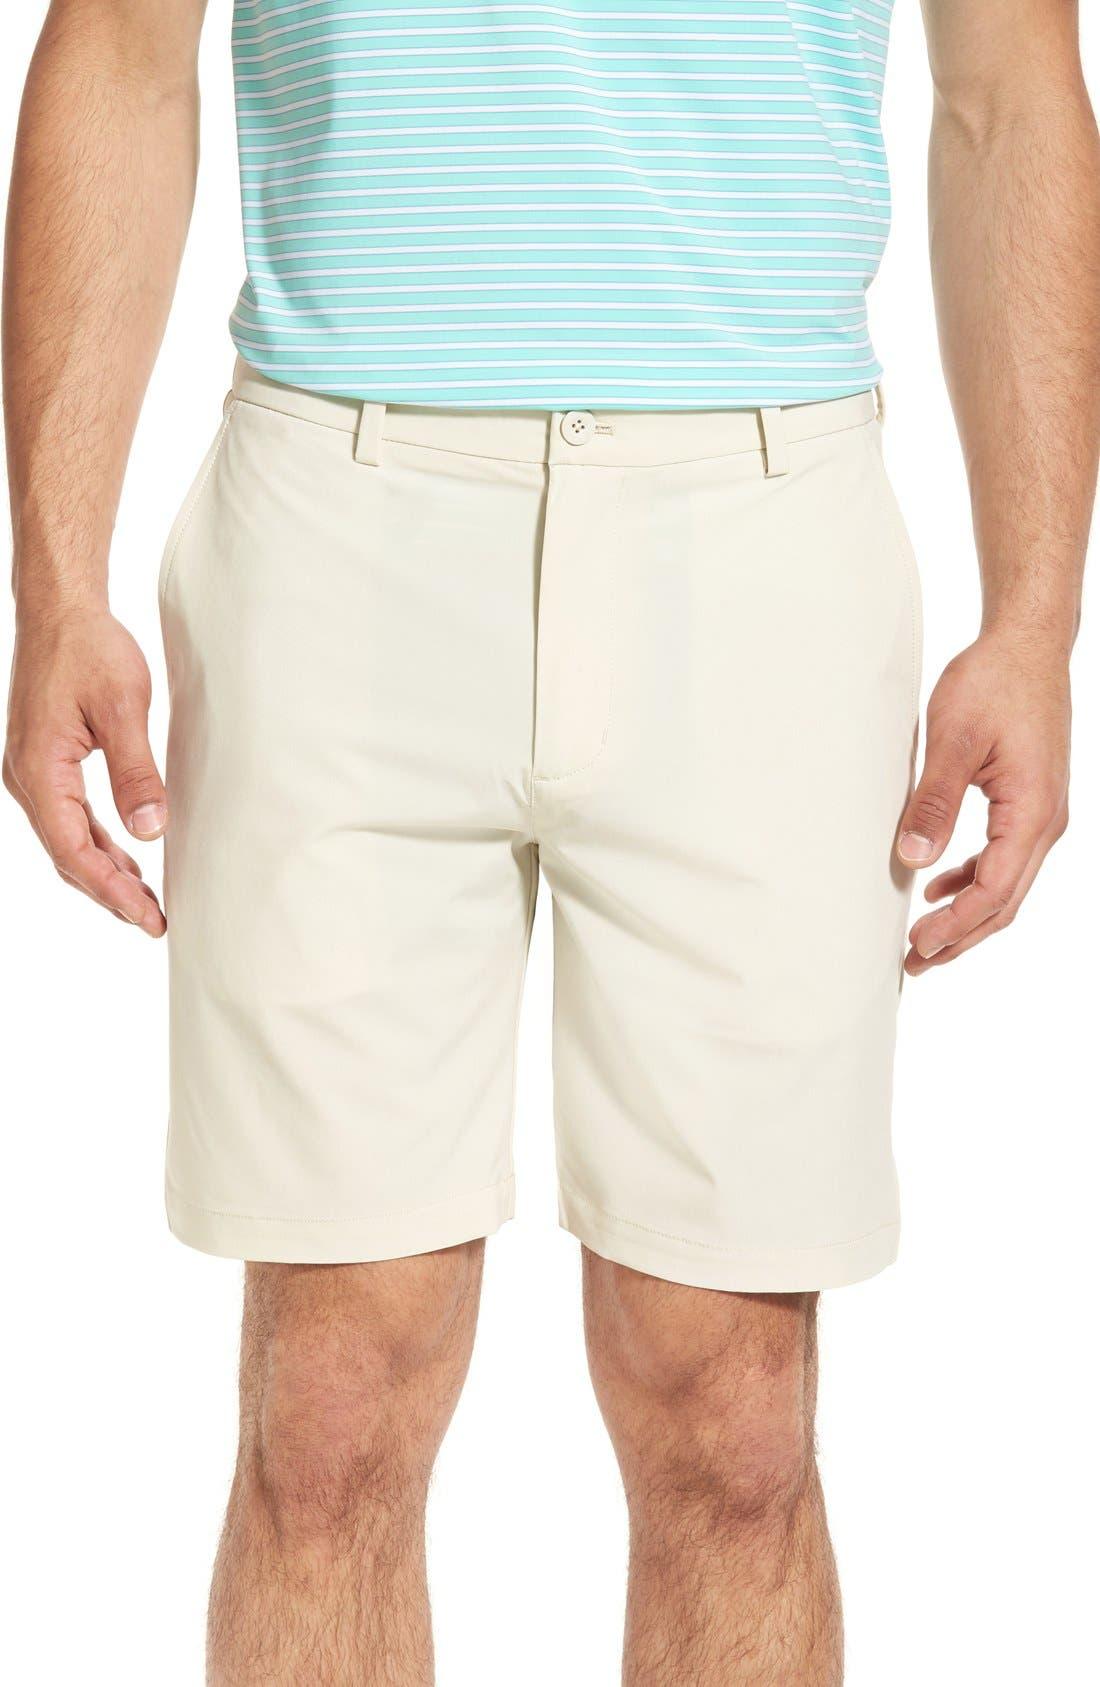 8 Inch Performance Breaker Shorts,                         Main,                         color, Stone